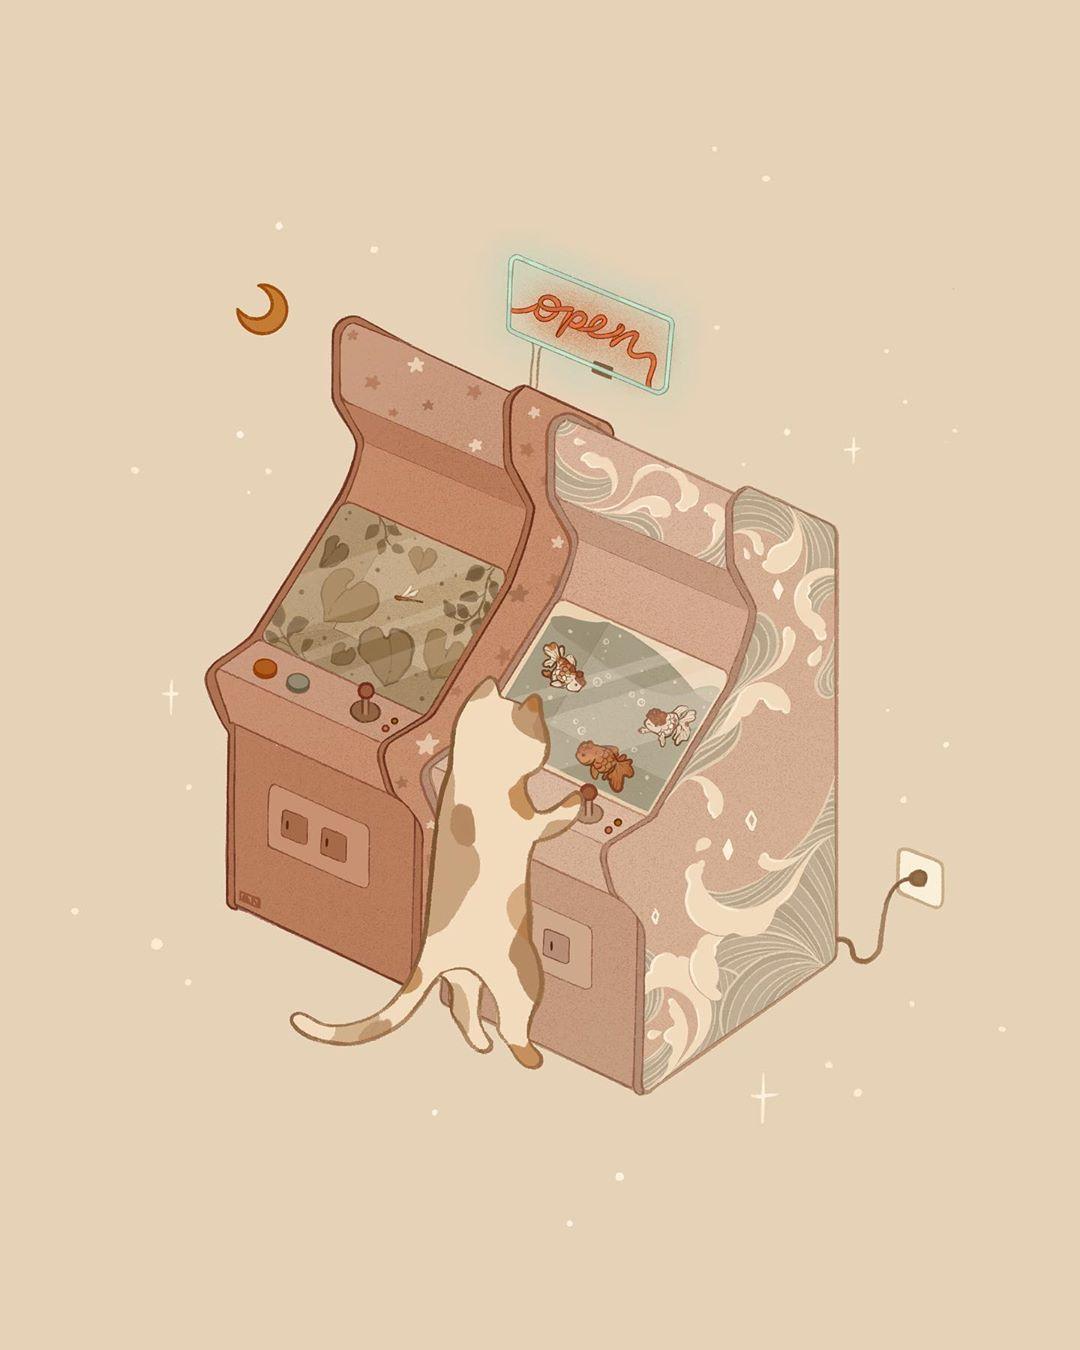 Cat illustration by Angie Nguyen